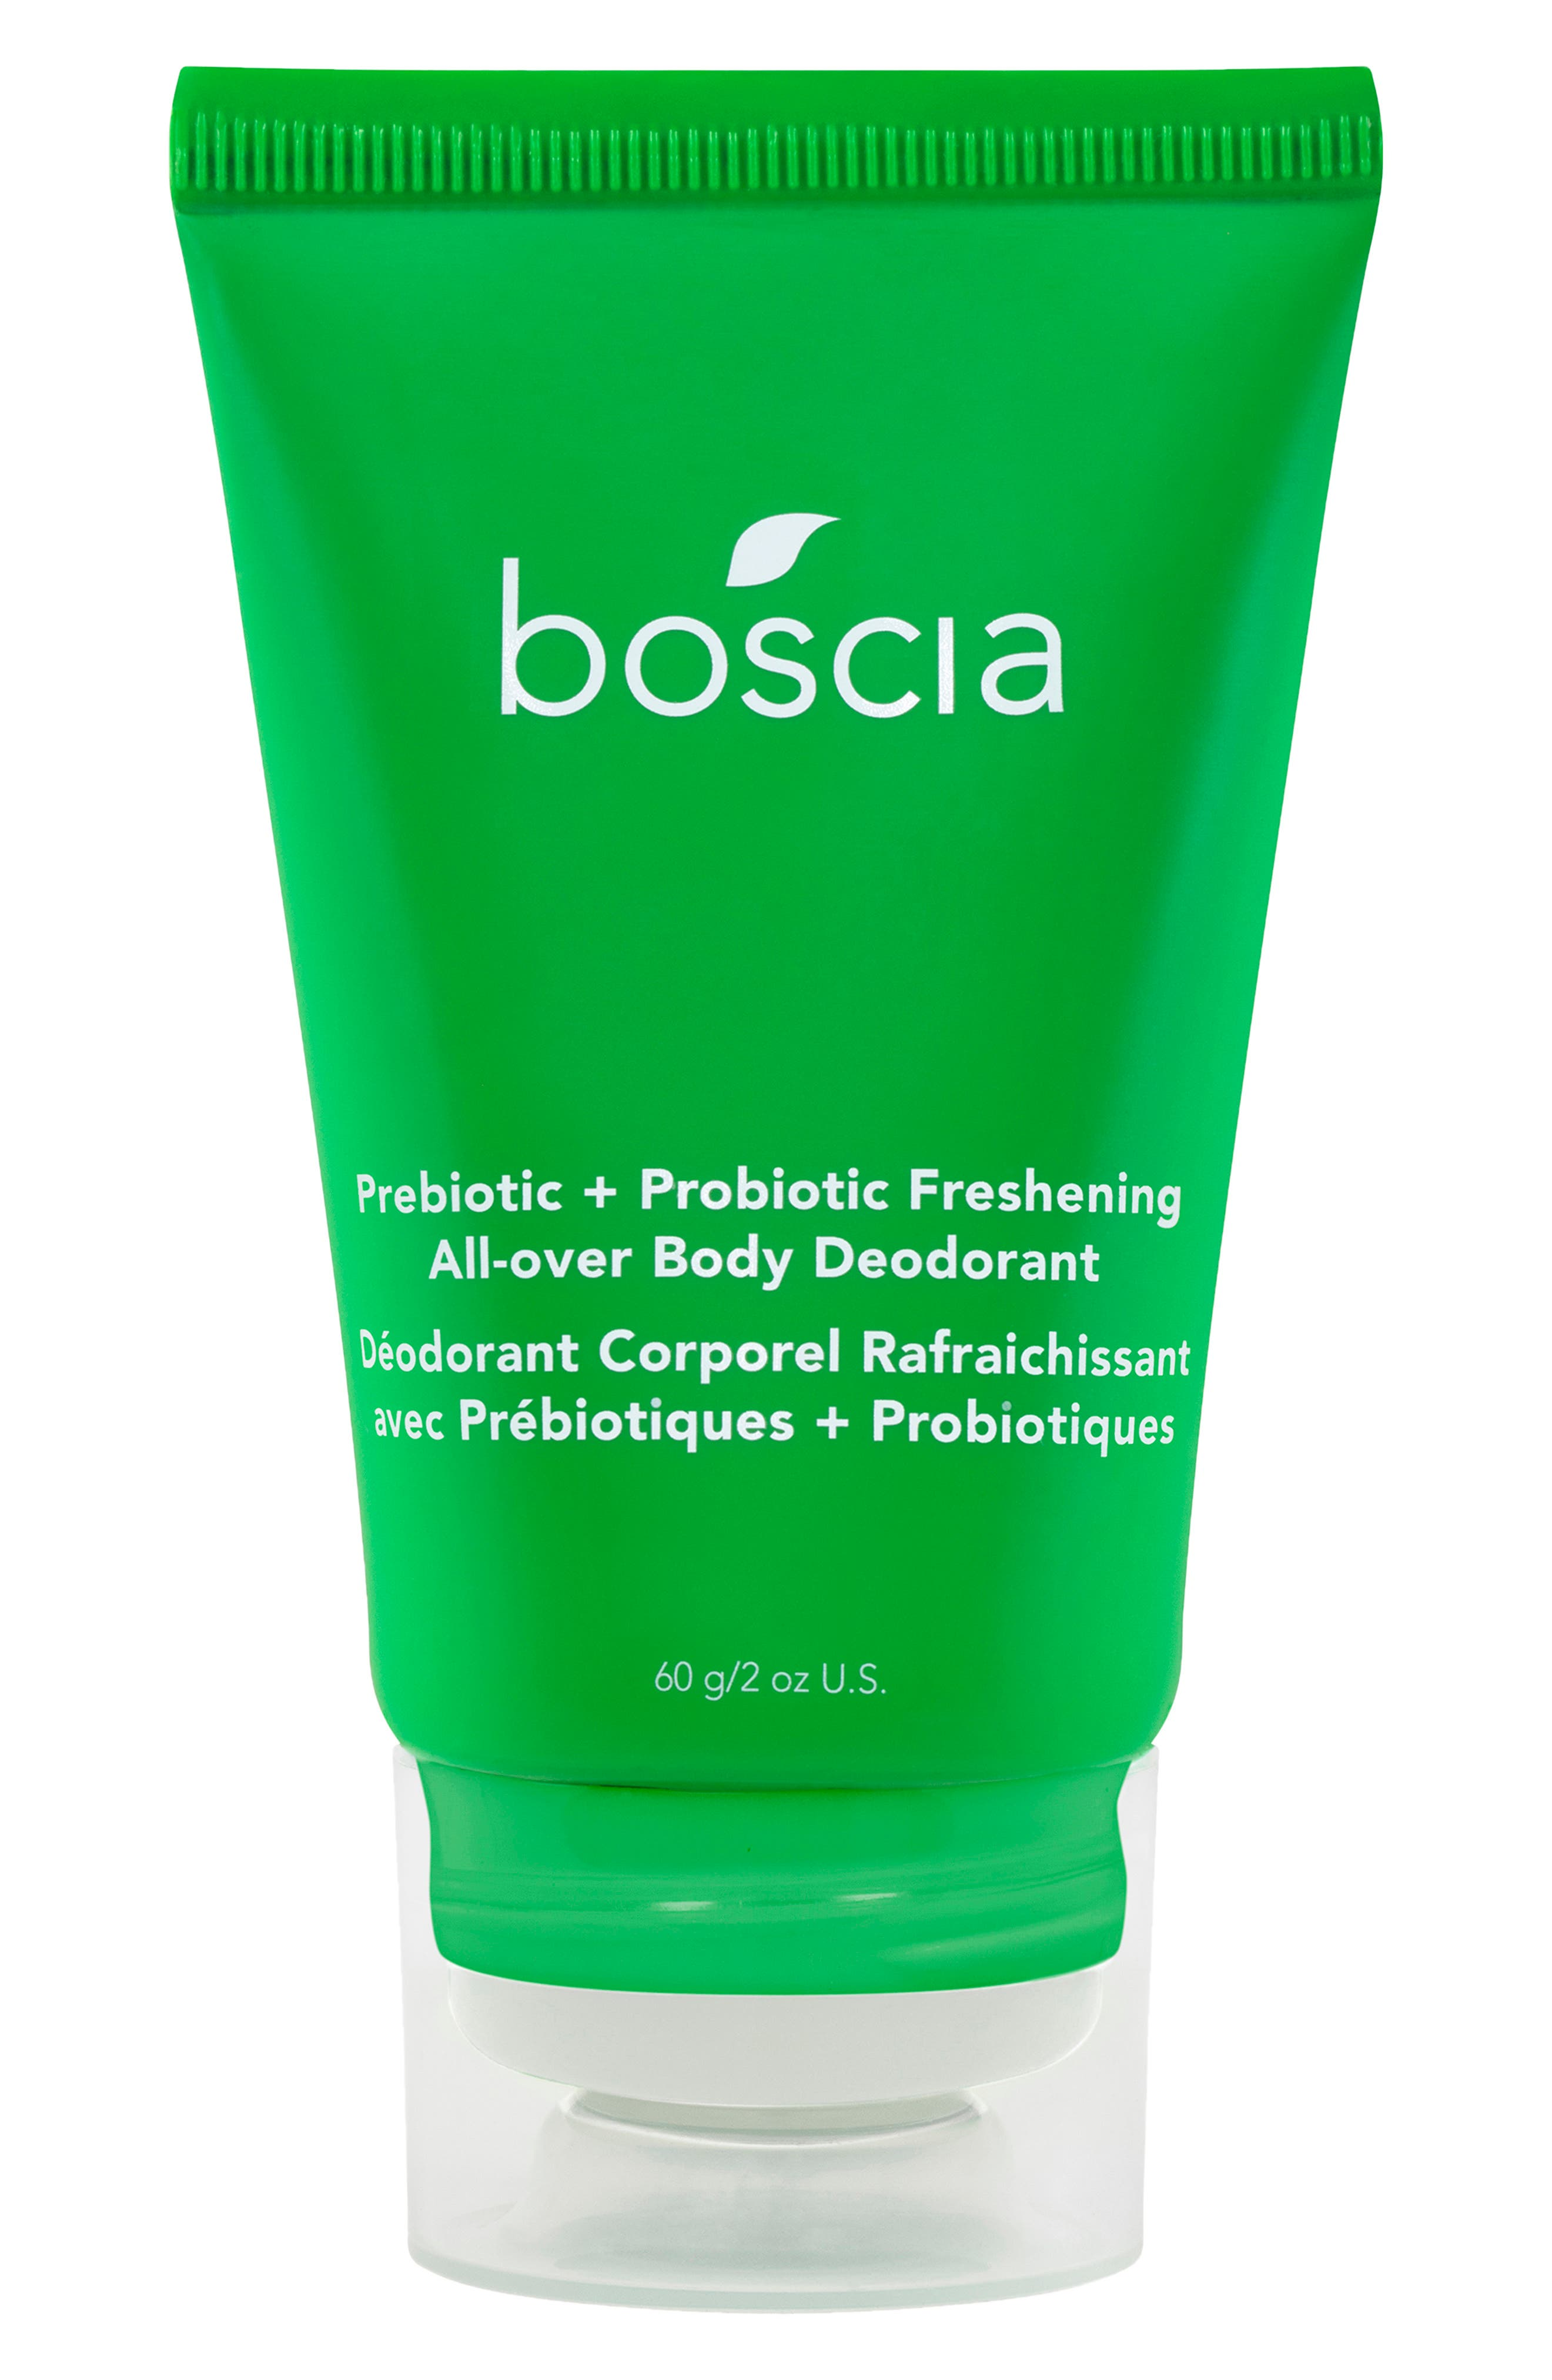 Prebiotic + Probiotic Freshening All-Over Body Deodorant